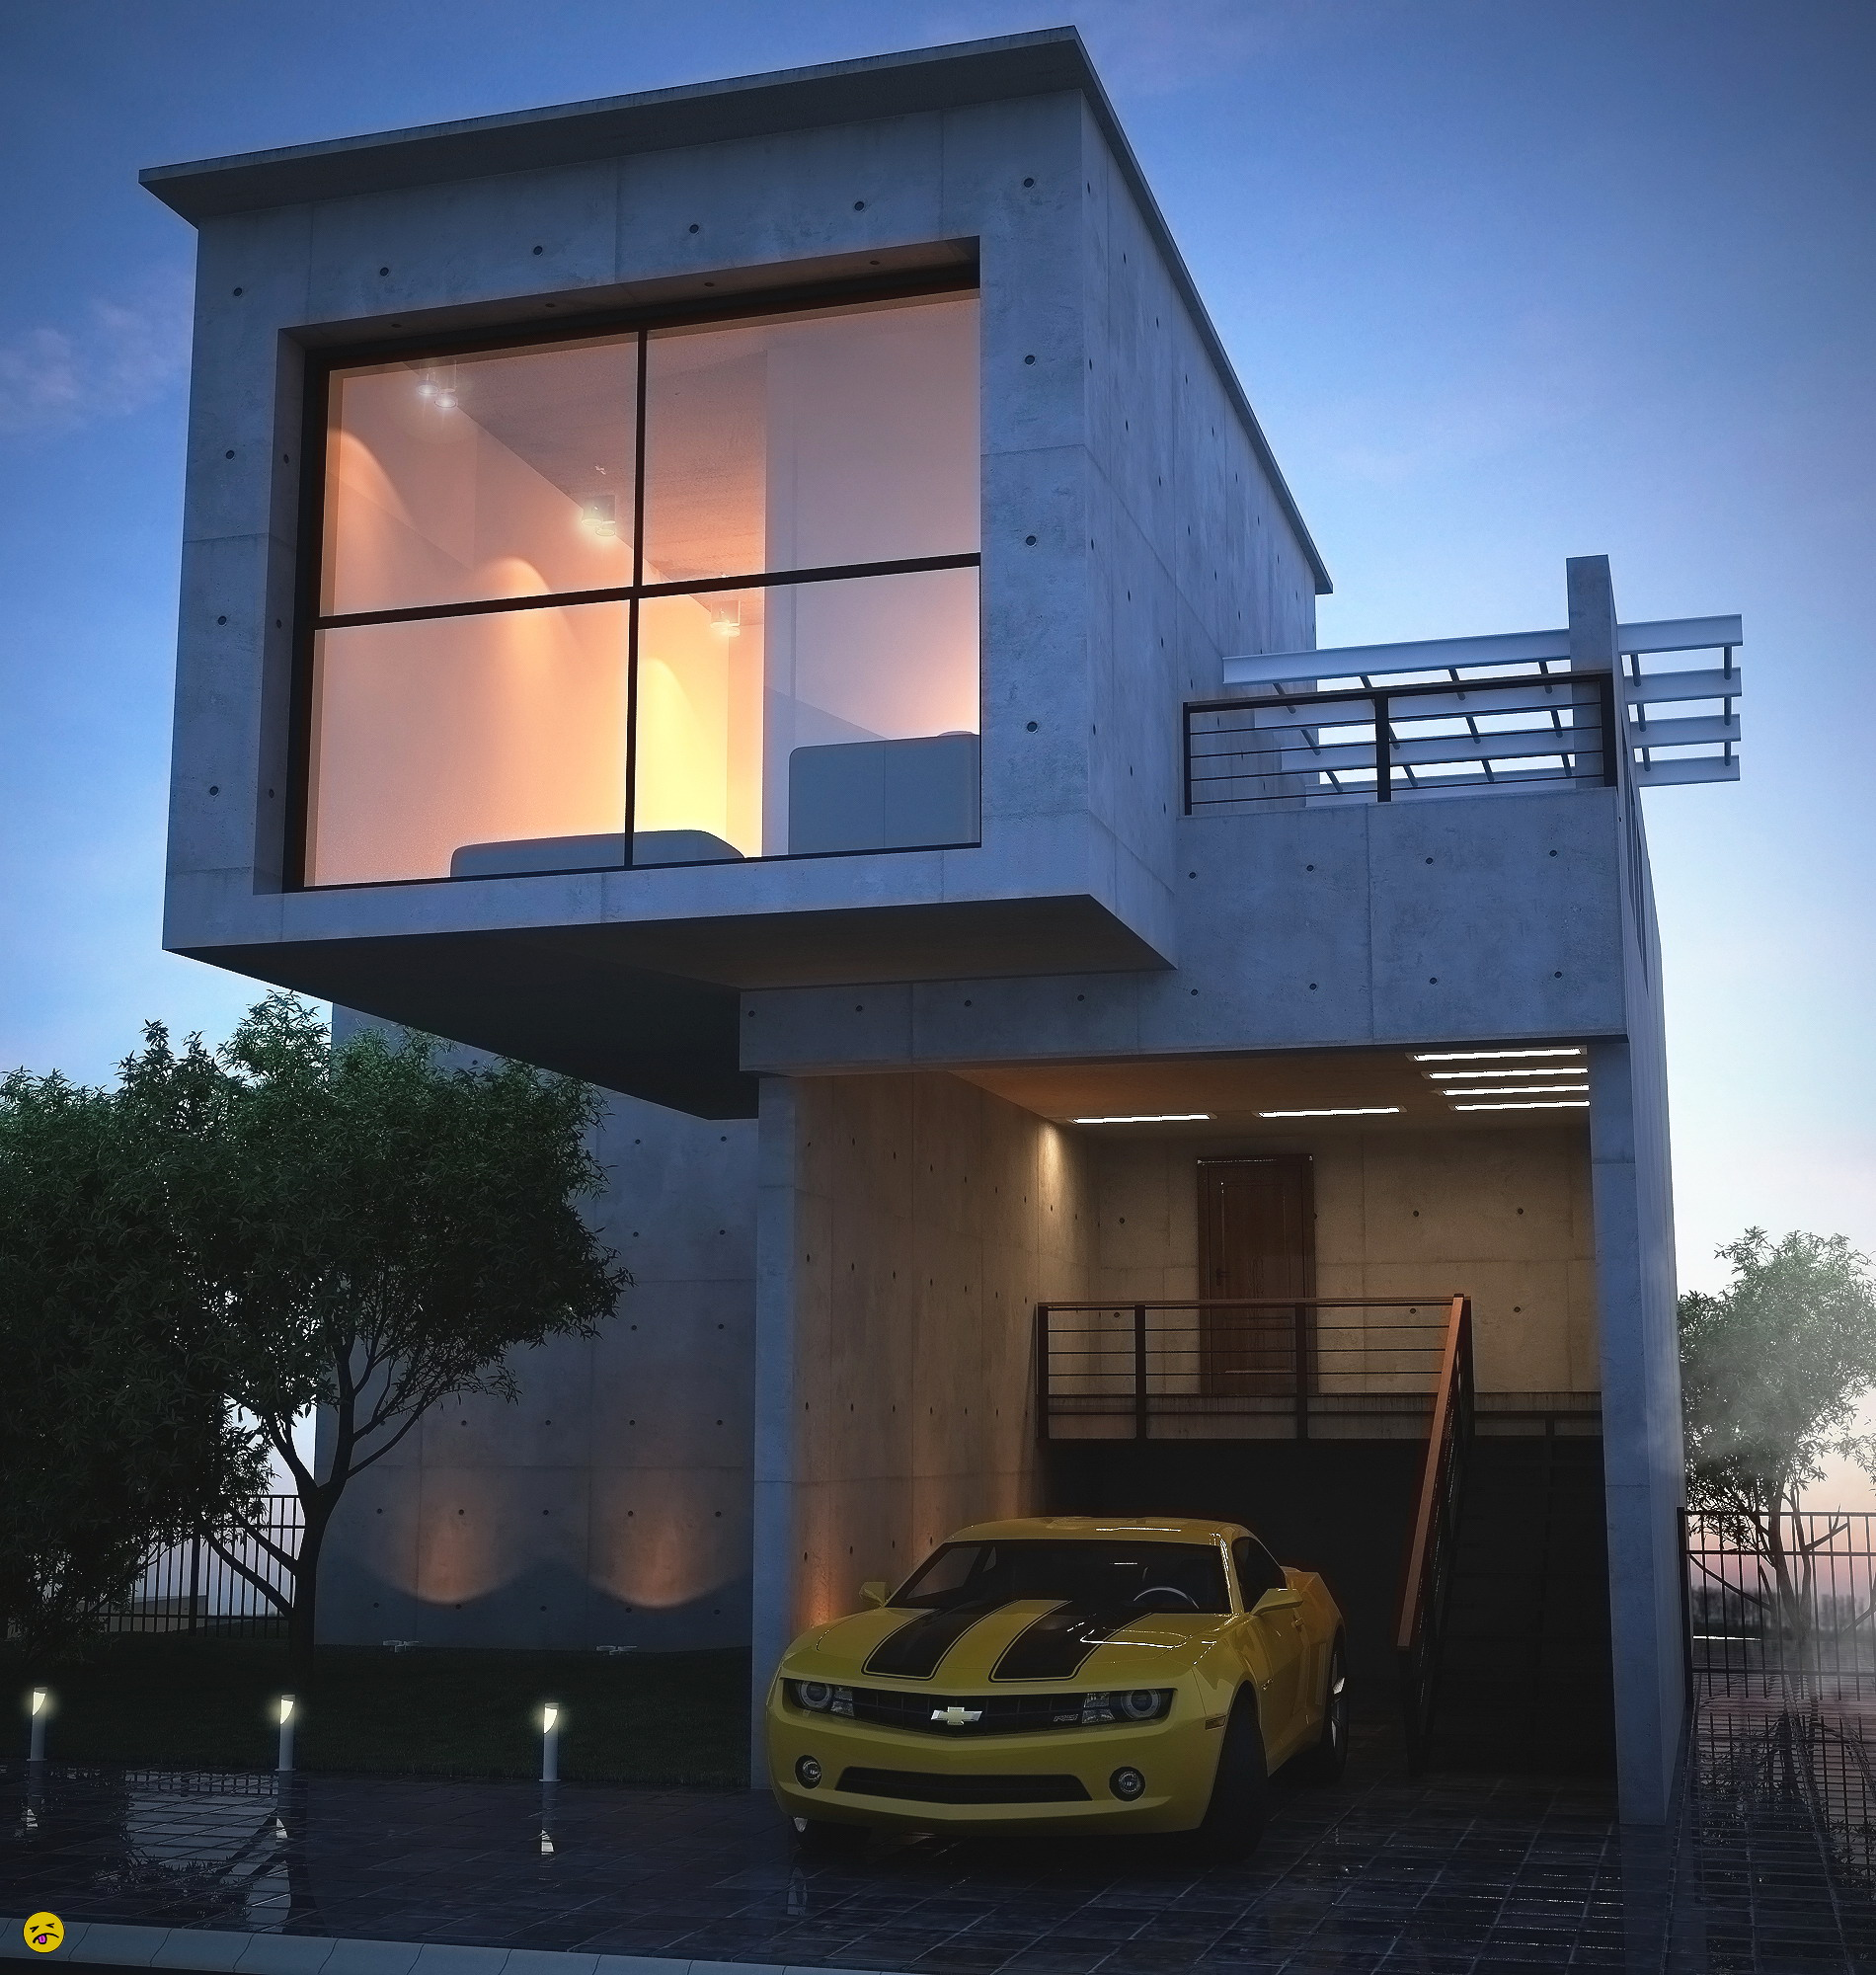 Beau 49. Concrete House